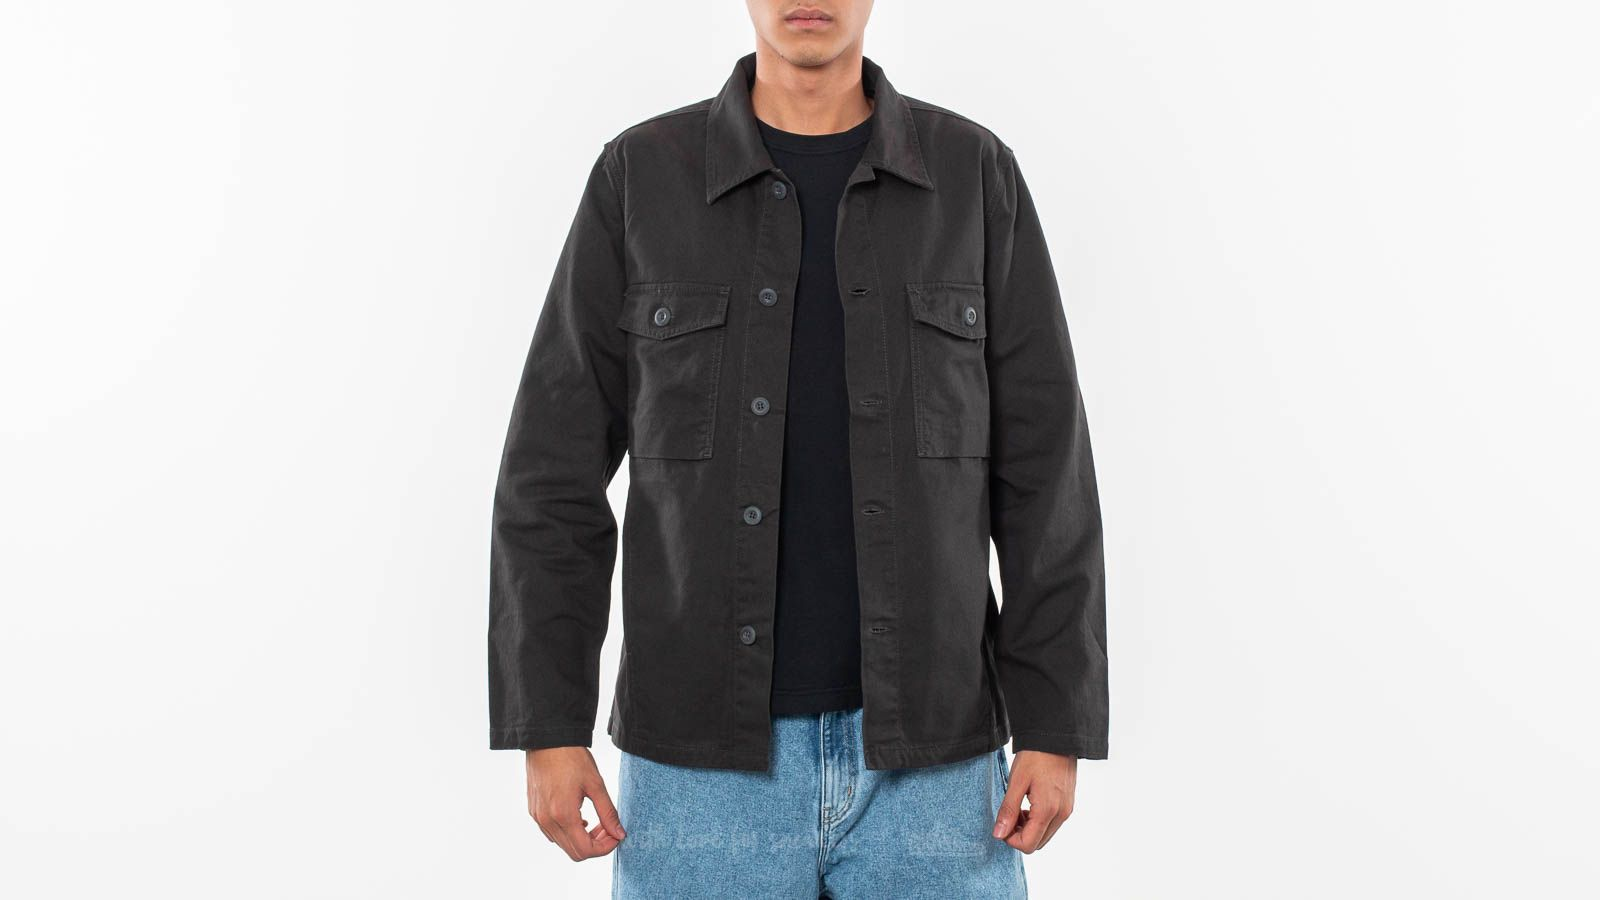 Junk de Luxe Liudvikas Shirt Dusty Black za skvelú cenu 38 € kúpite na Footshop.sk